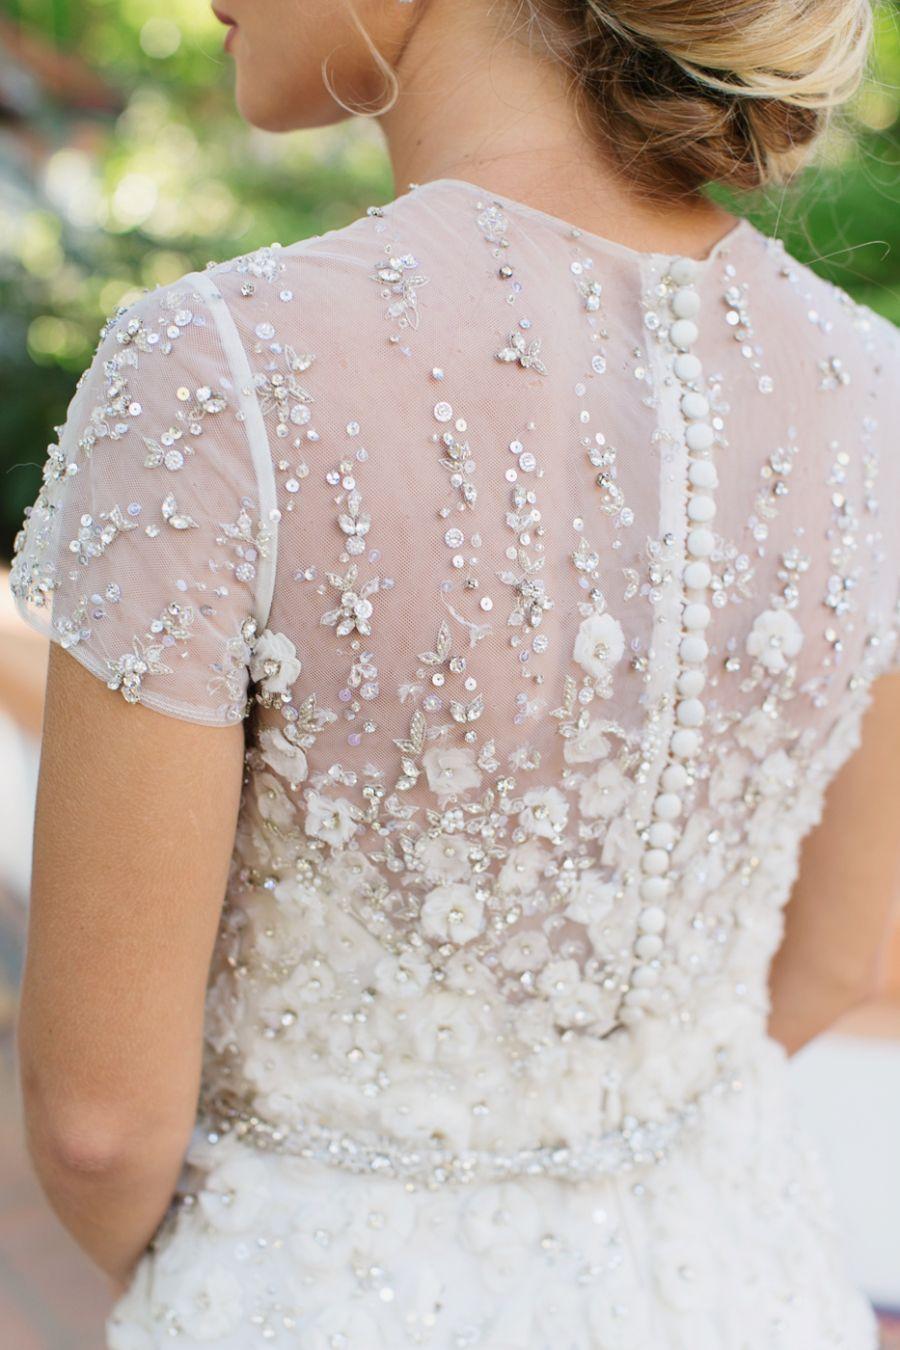 Beaded Sheer Short Sleeve Wedding Dress Http Www Stylemepretty Com 2016 02 23 Trend Wedding Dresses Beaded Short Sleeve Wedding Dress Wedding Dress Sleeves [ 1350 x 900 Pixel ]